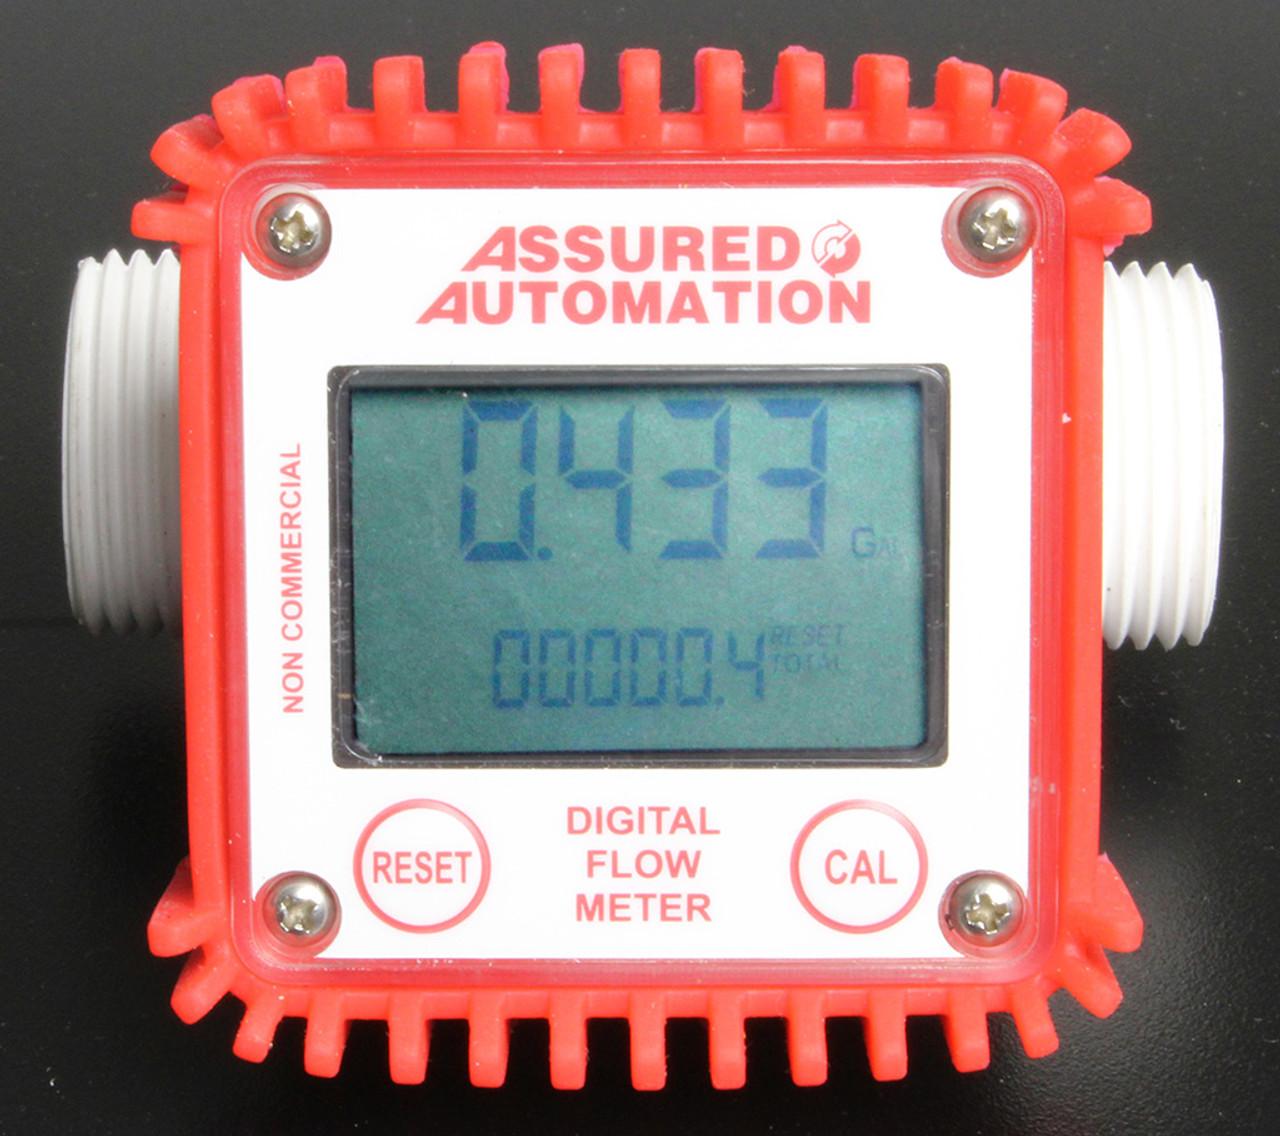 Digital Water Meter : Digital fluid flow meter with resettable totals and